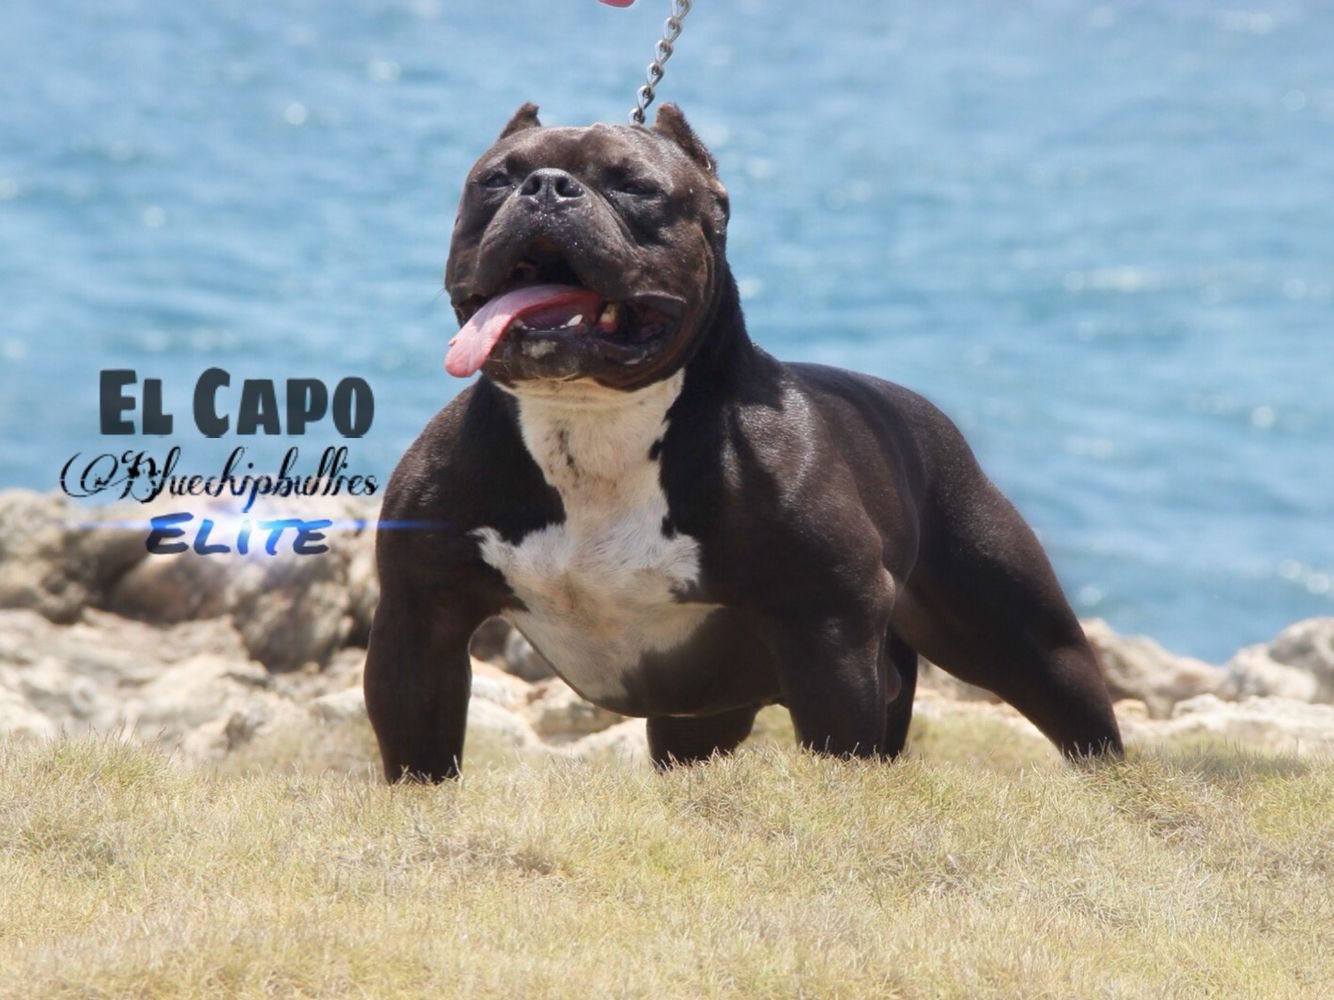 El Capo Line Bully Dog Bully Breeds Dogs American Bully